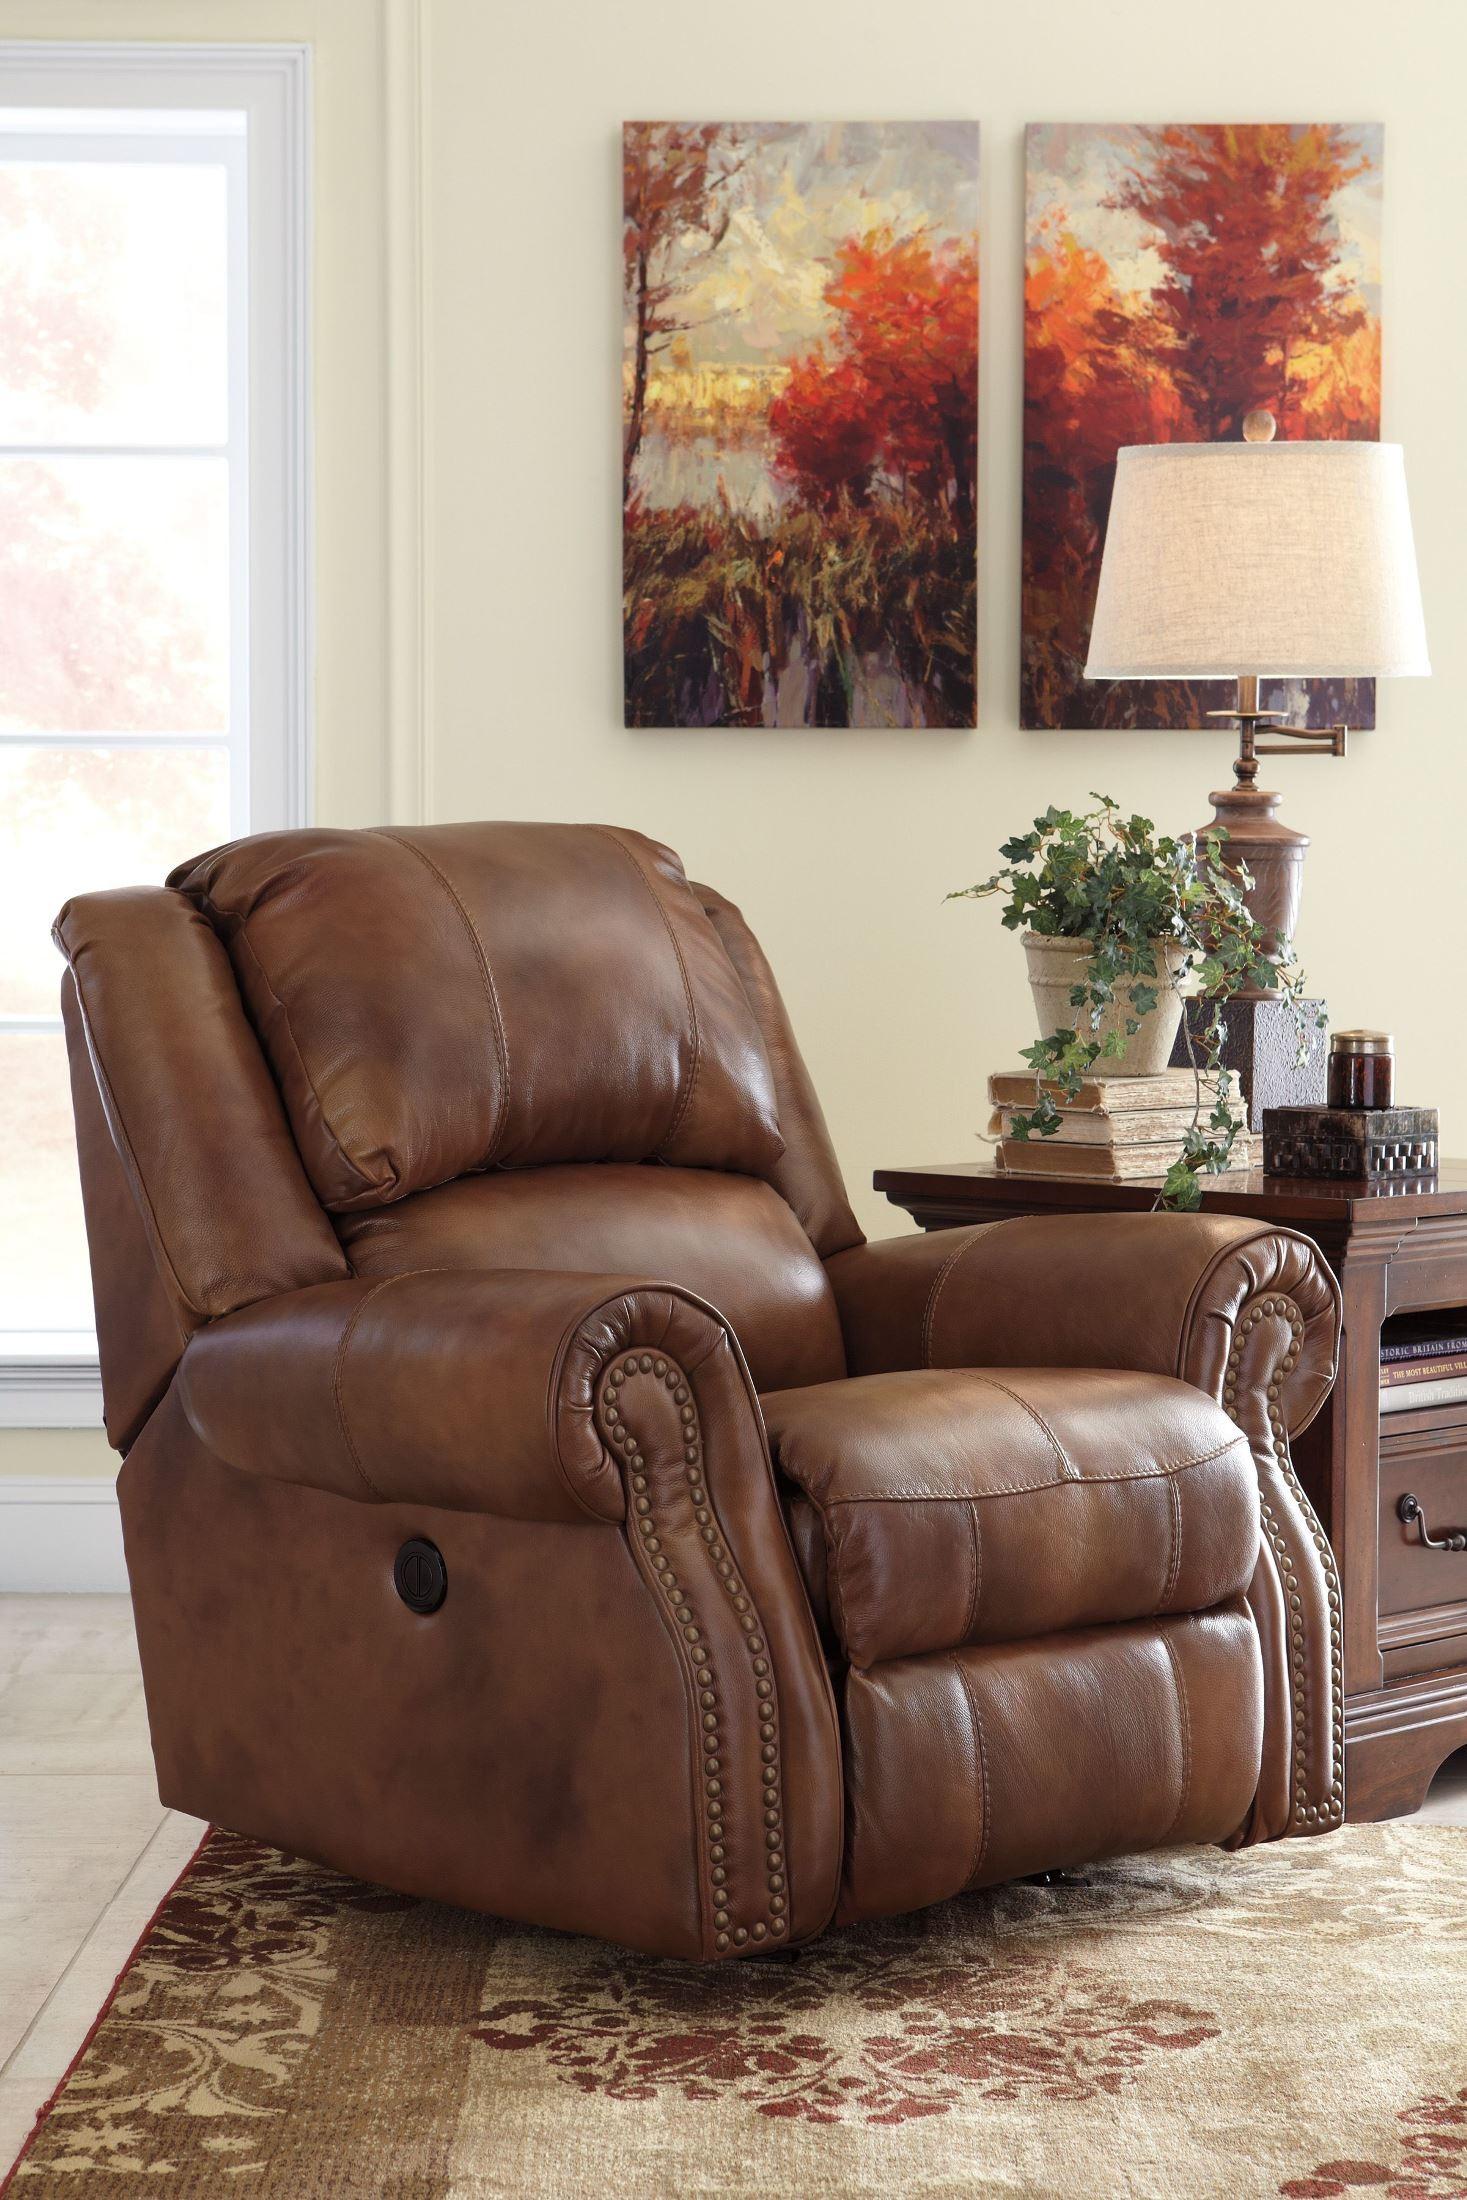 Walworth Auburn Rocker Recliner From Ashley U7800125 Coleman Furniture